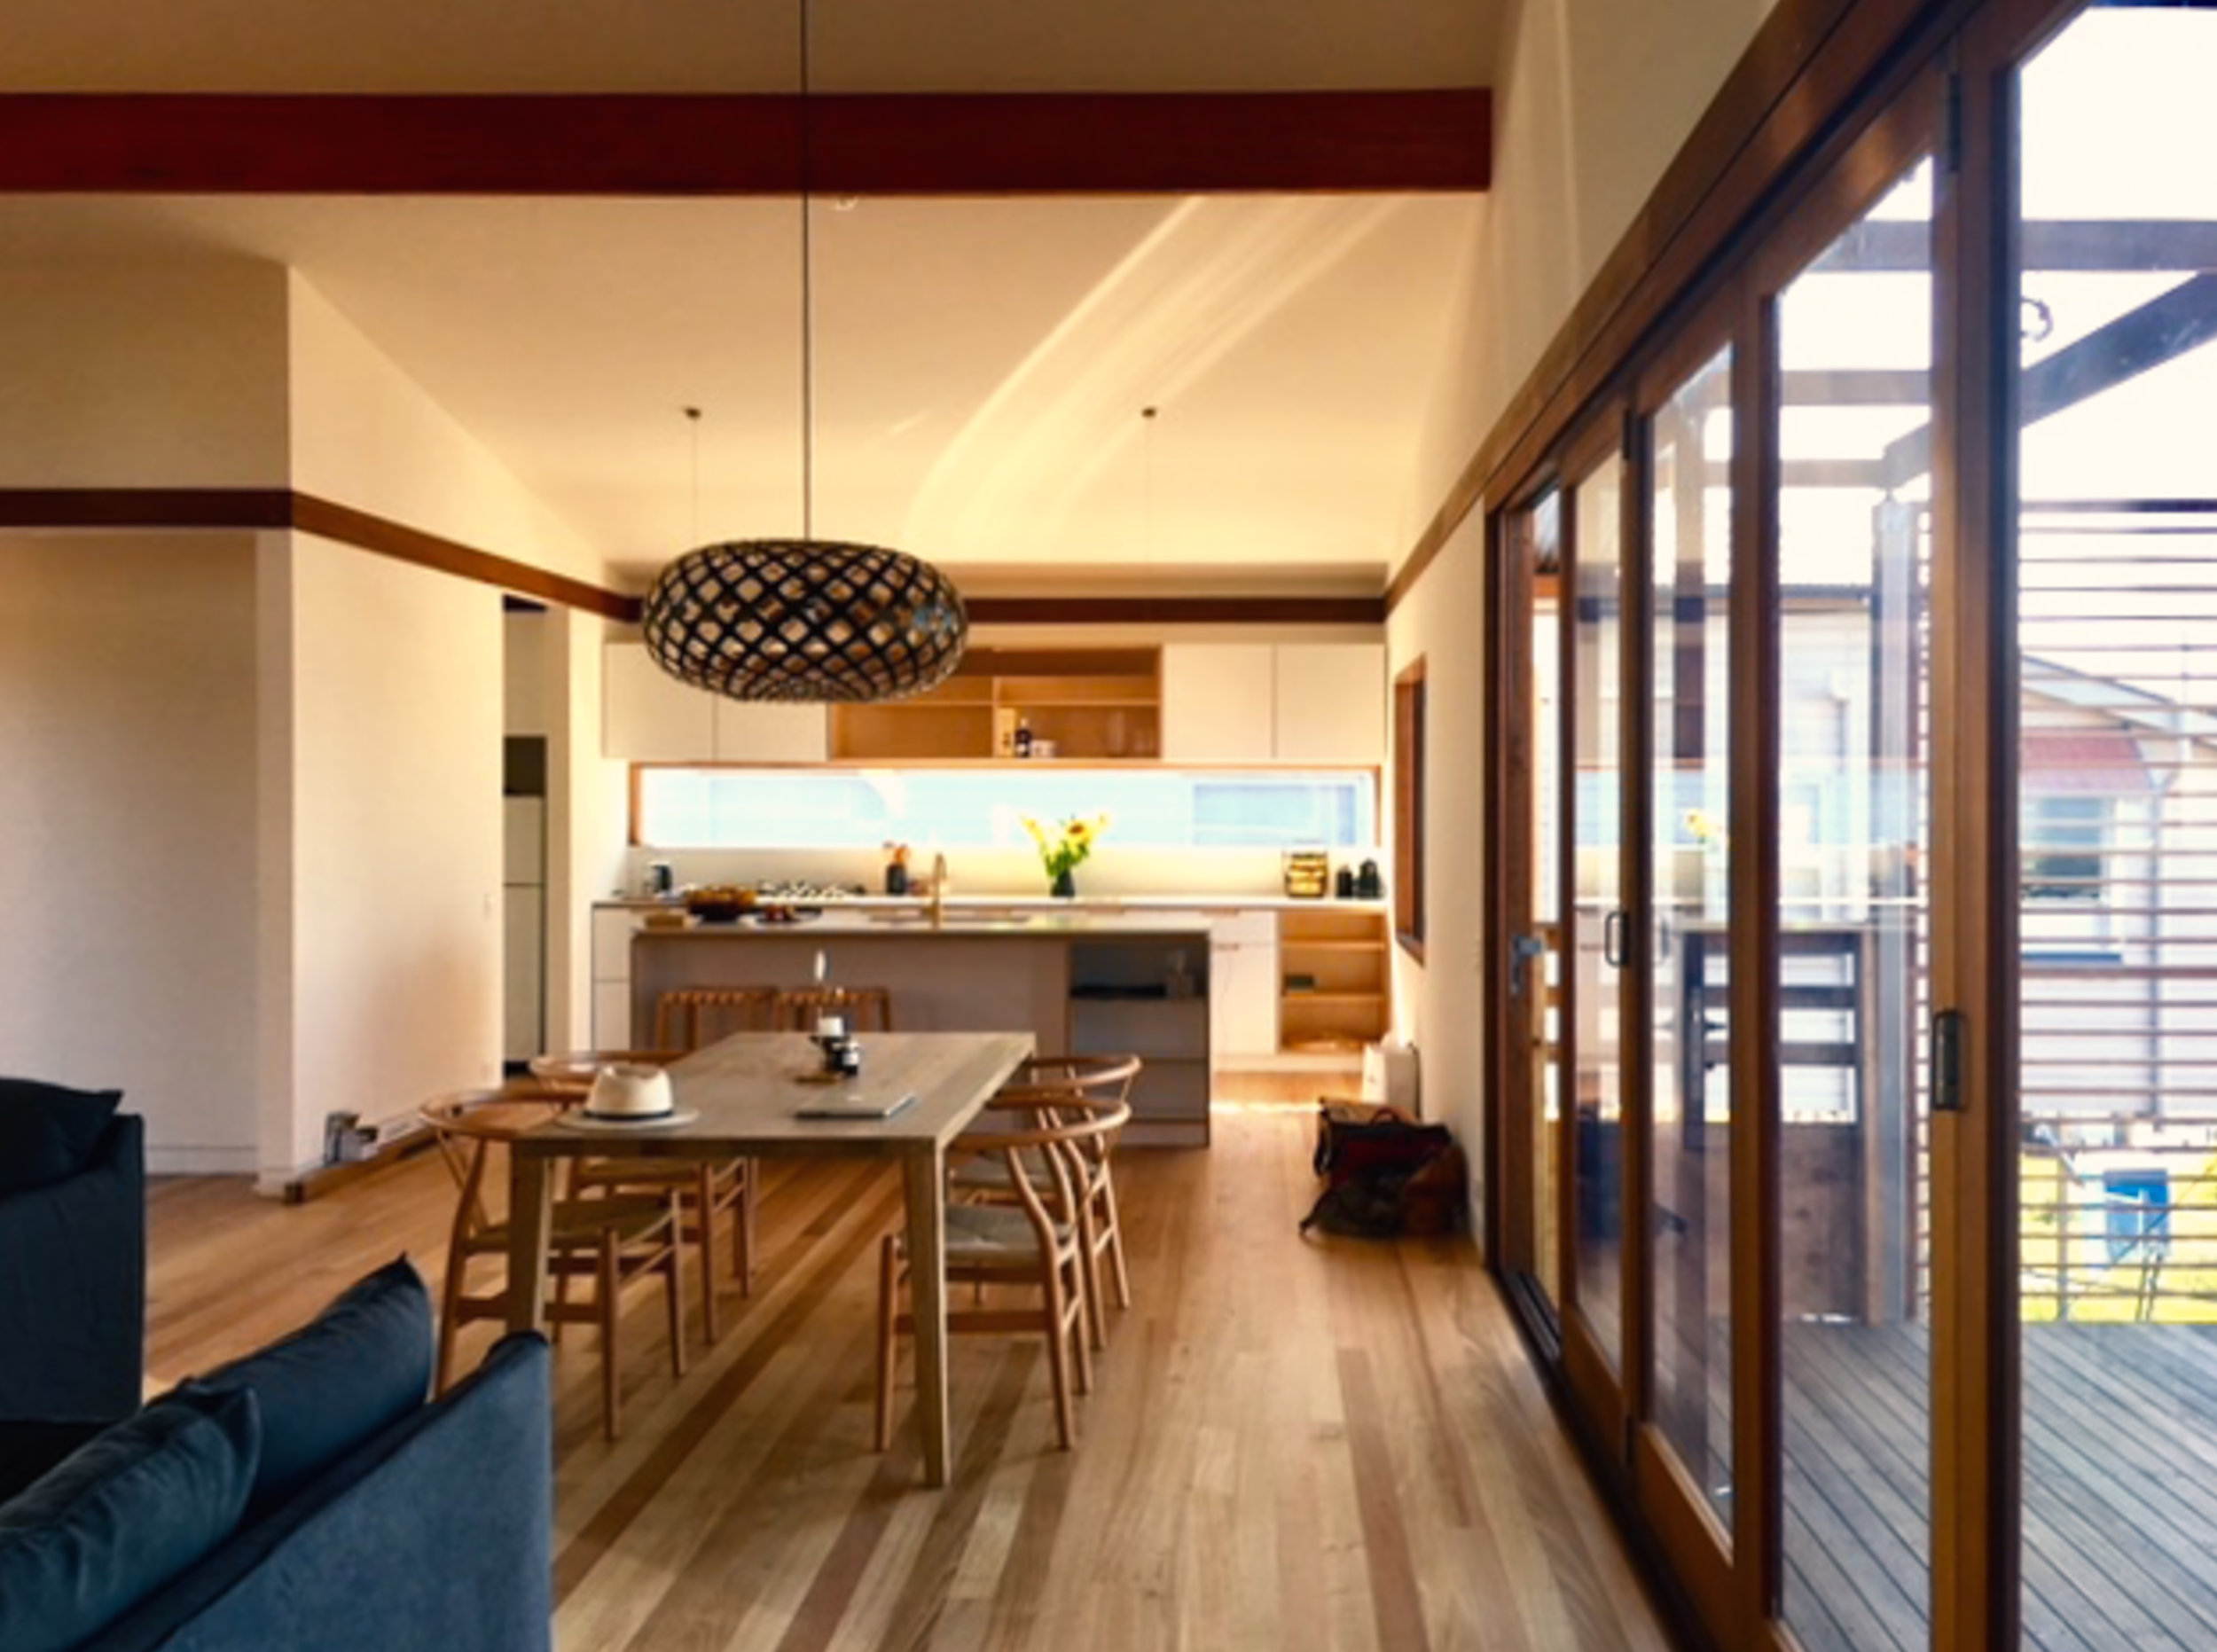 Takt Joint Bangalow bungalow kitchen.jpg